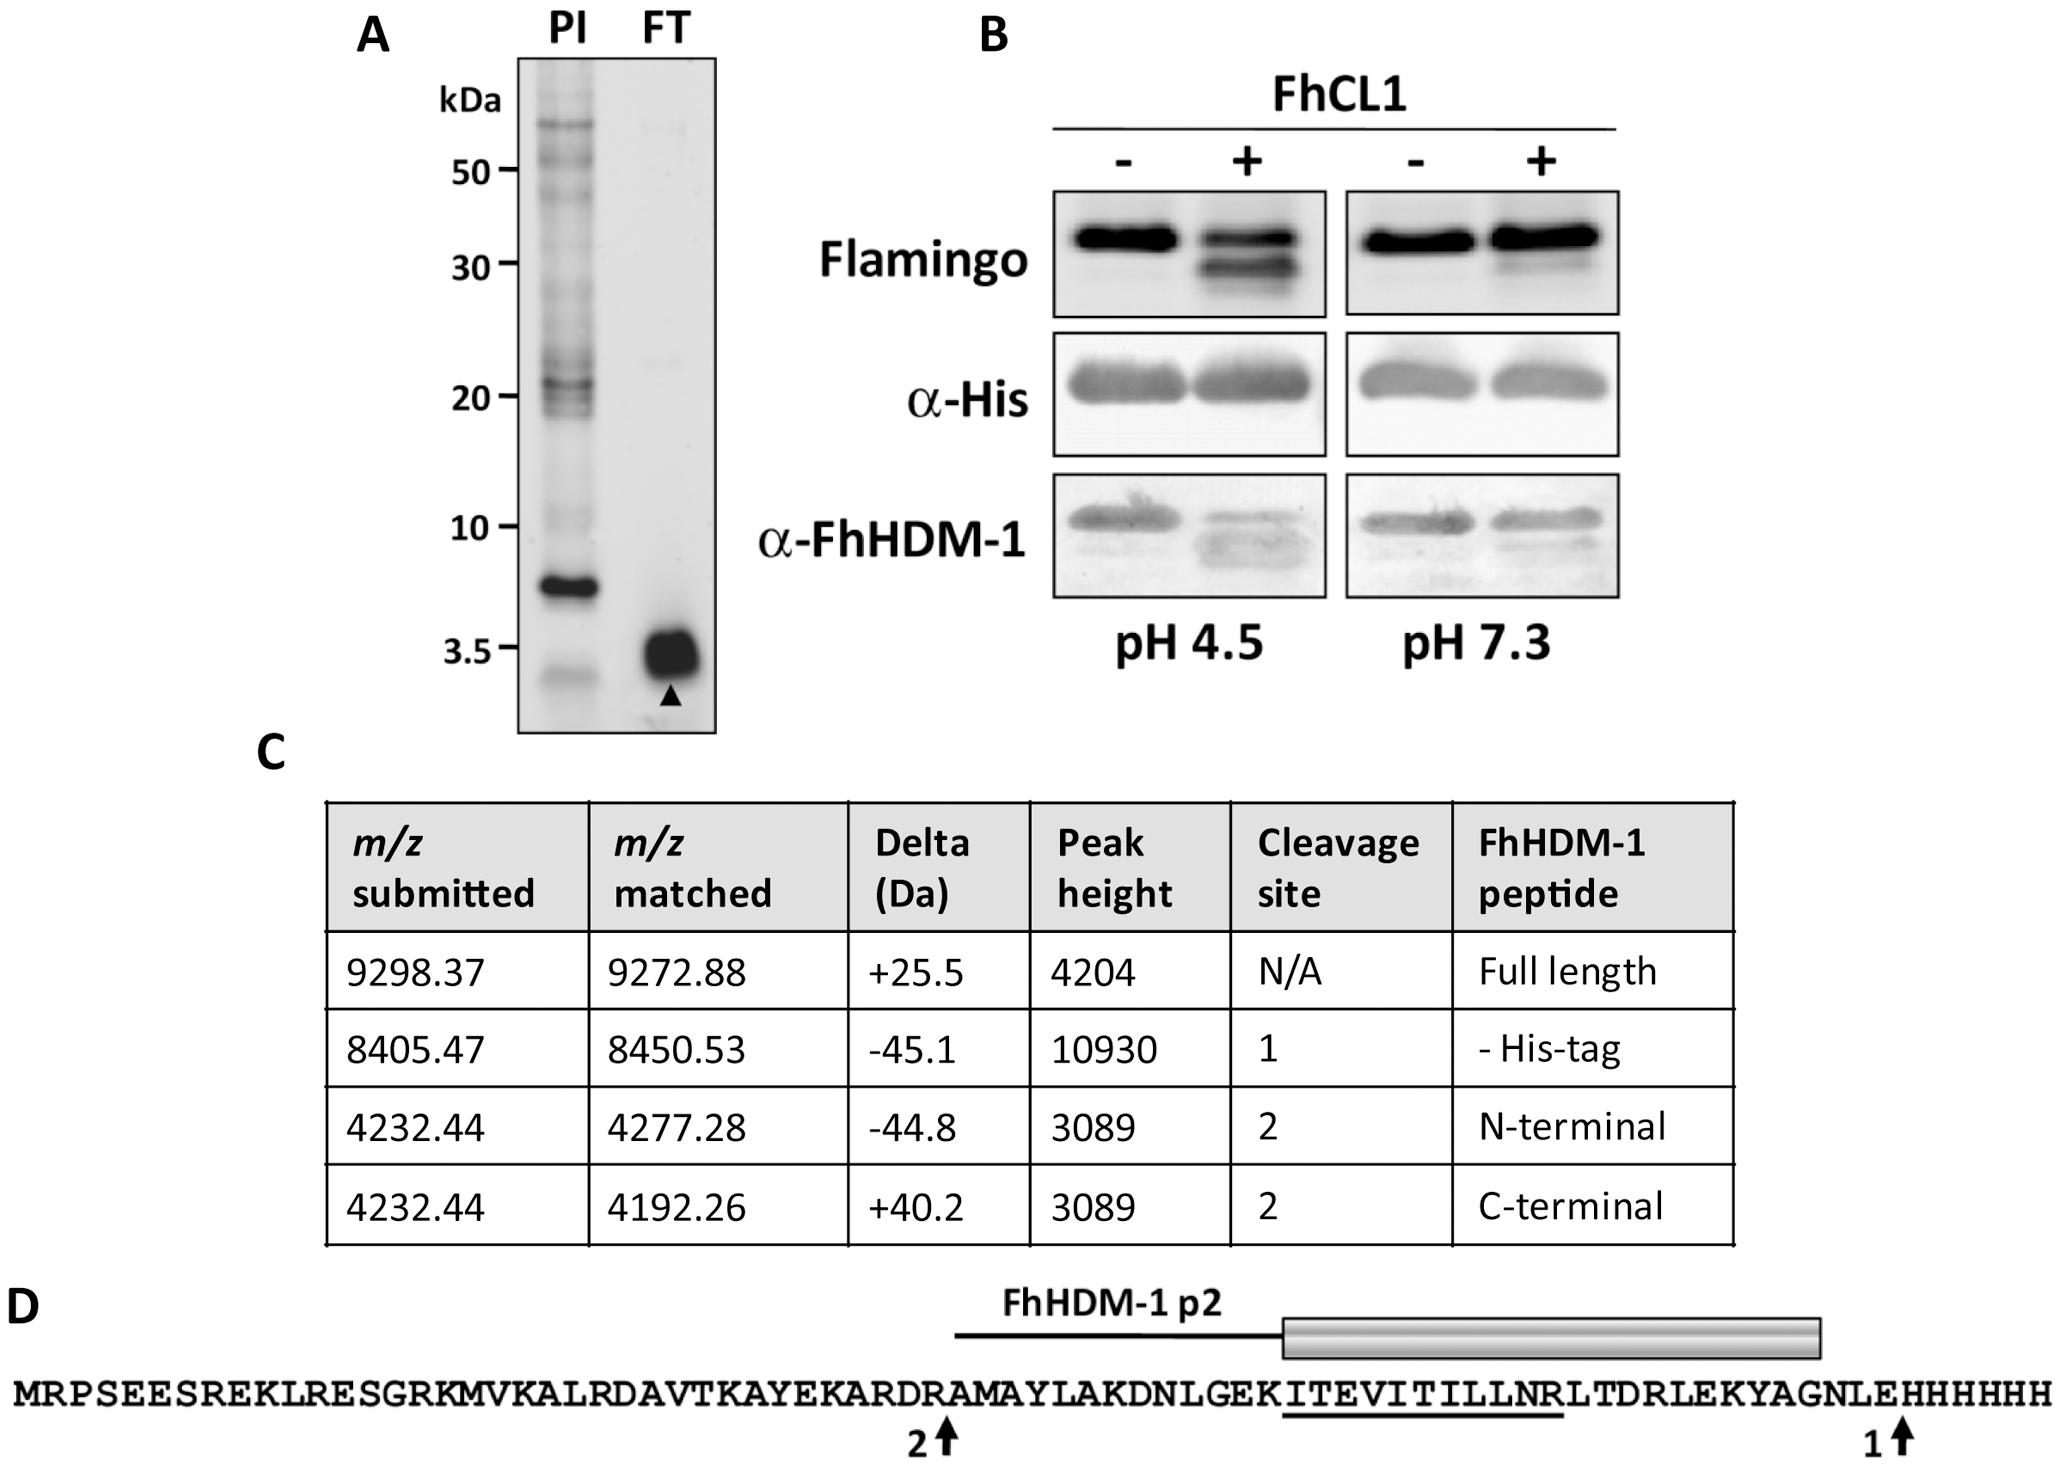 FhCL1 processes FhHDM-1 at low pH.